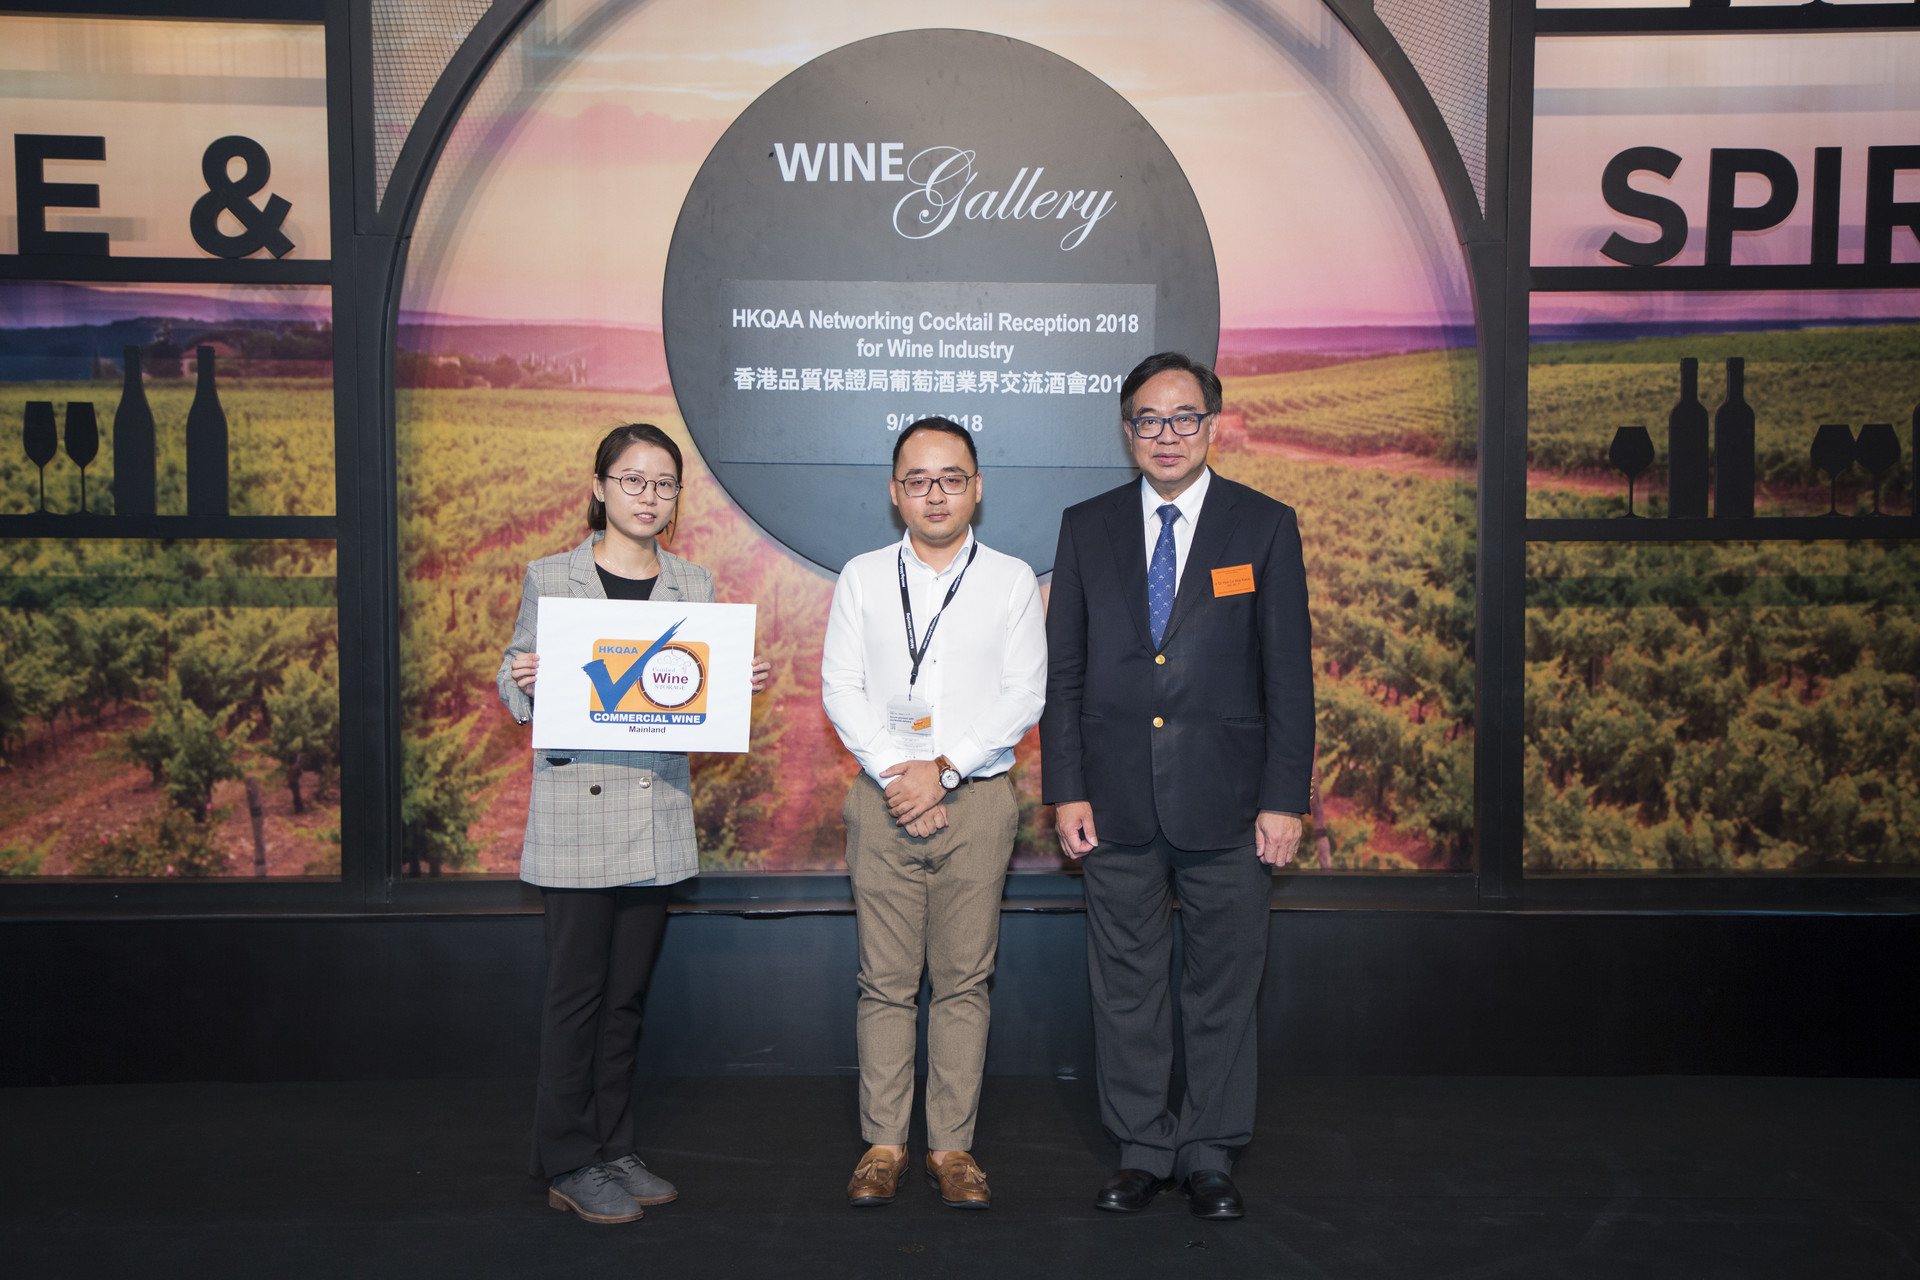 W+前海酒库专业仓储水平获业界认可